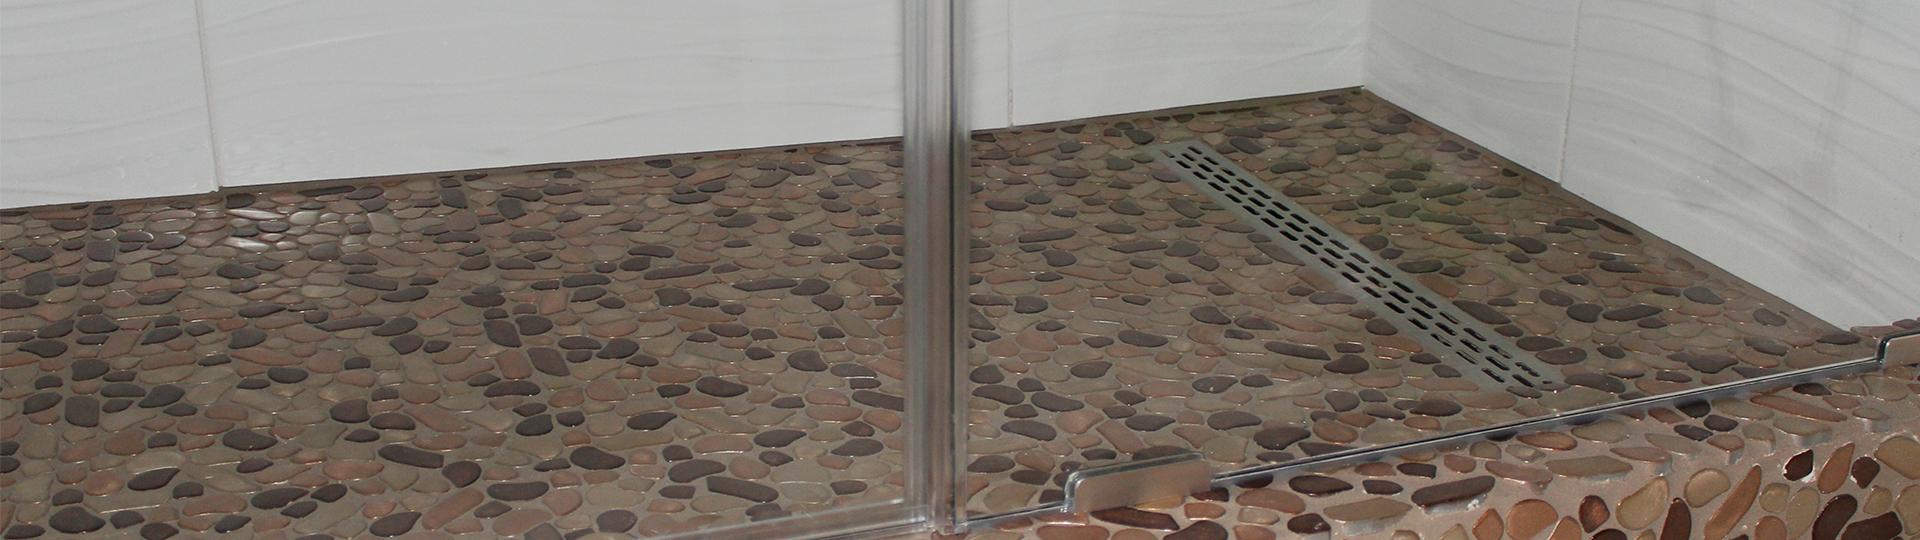 kbrs linear drain kbrs shower systems